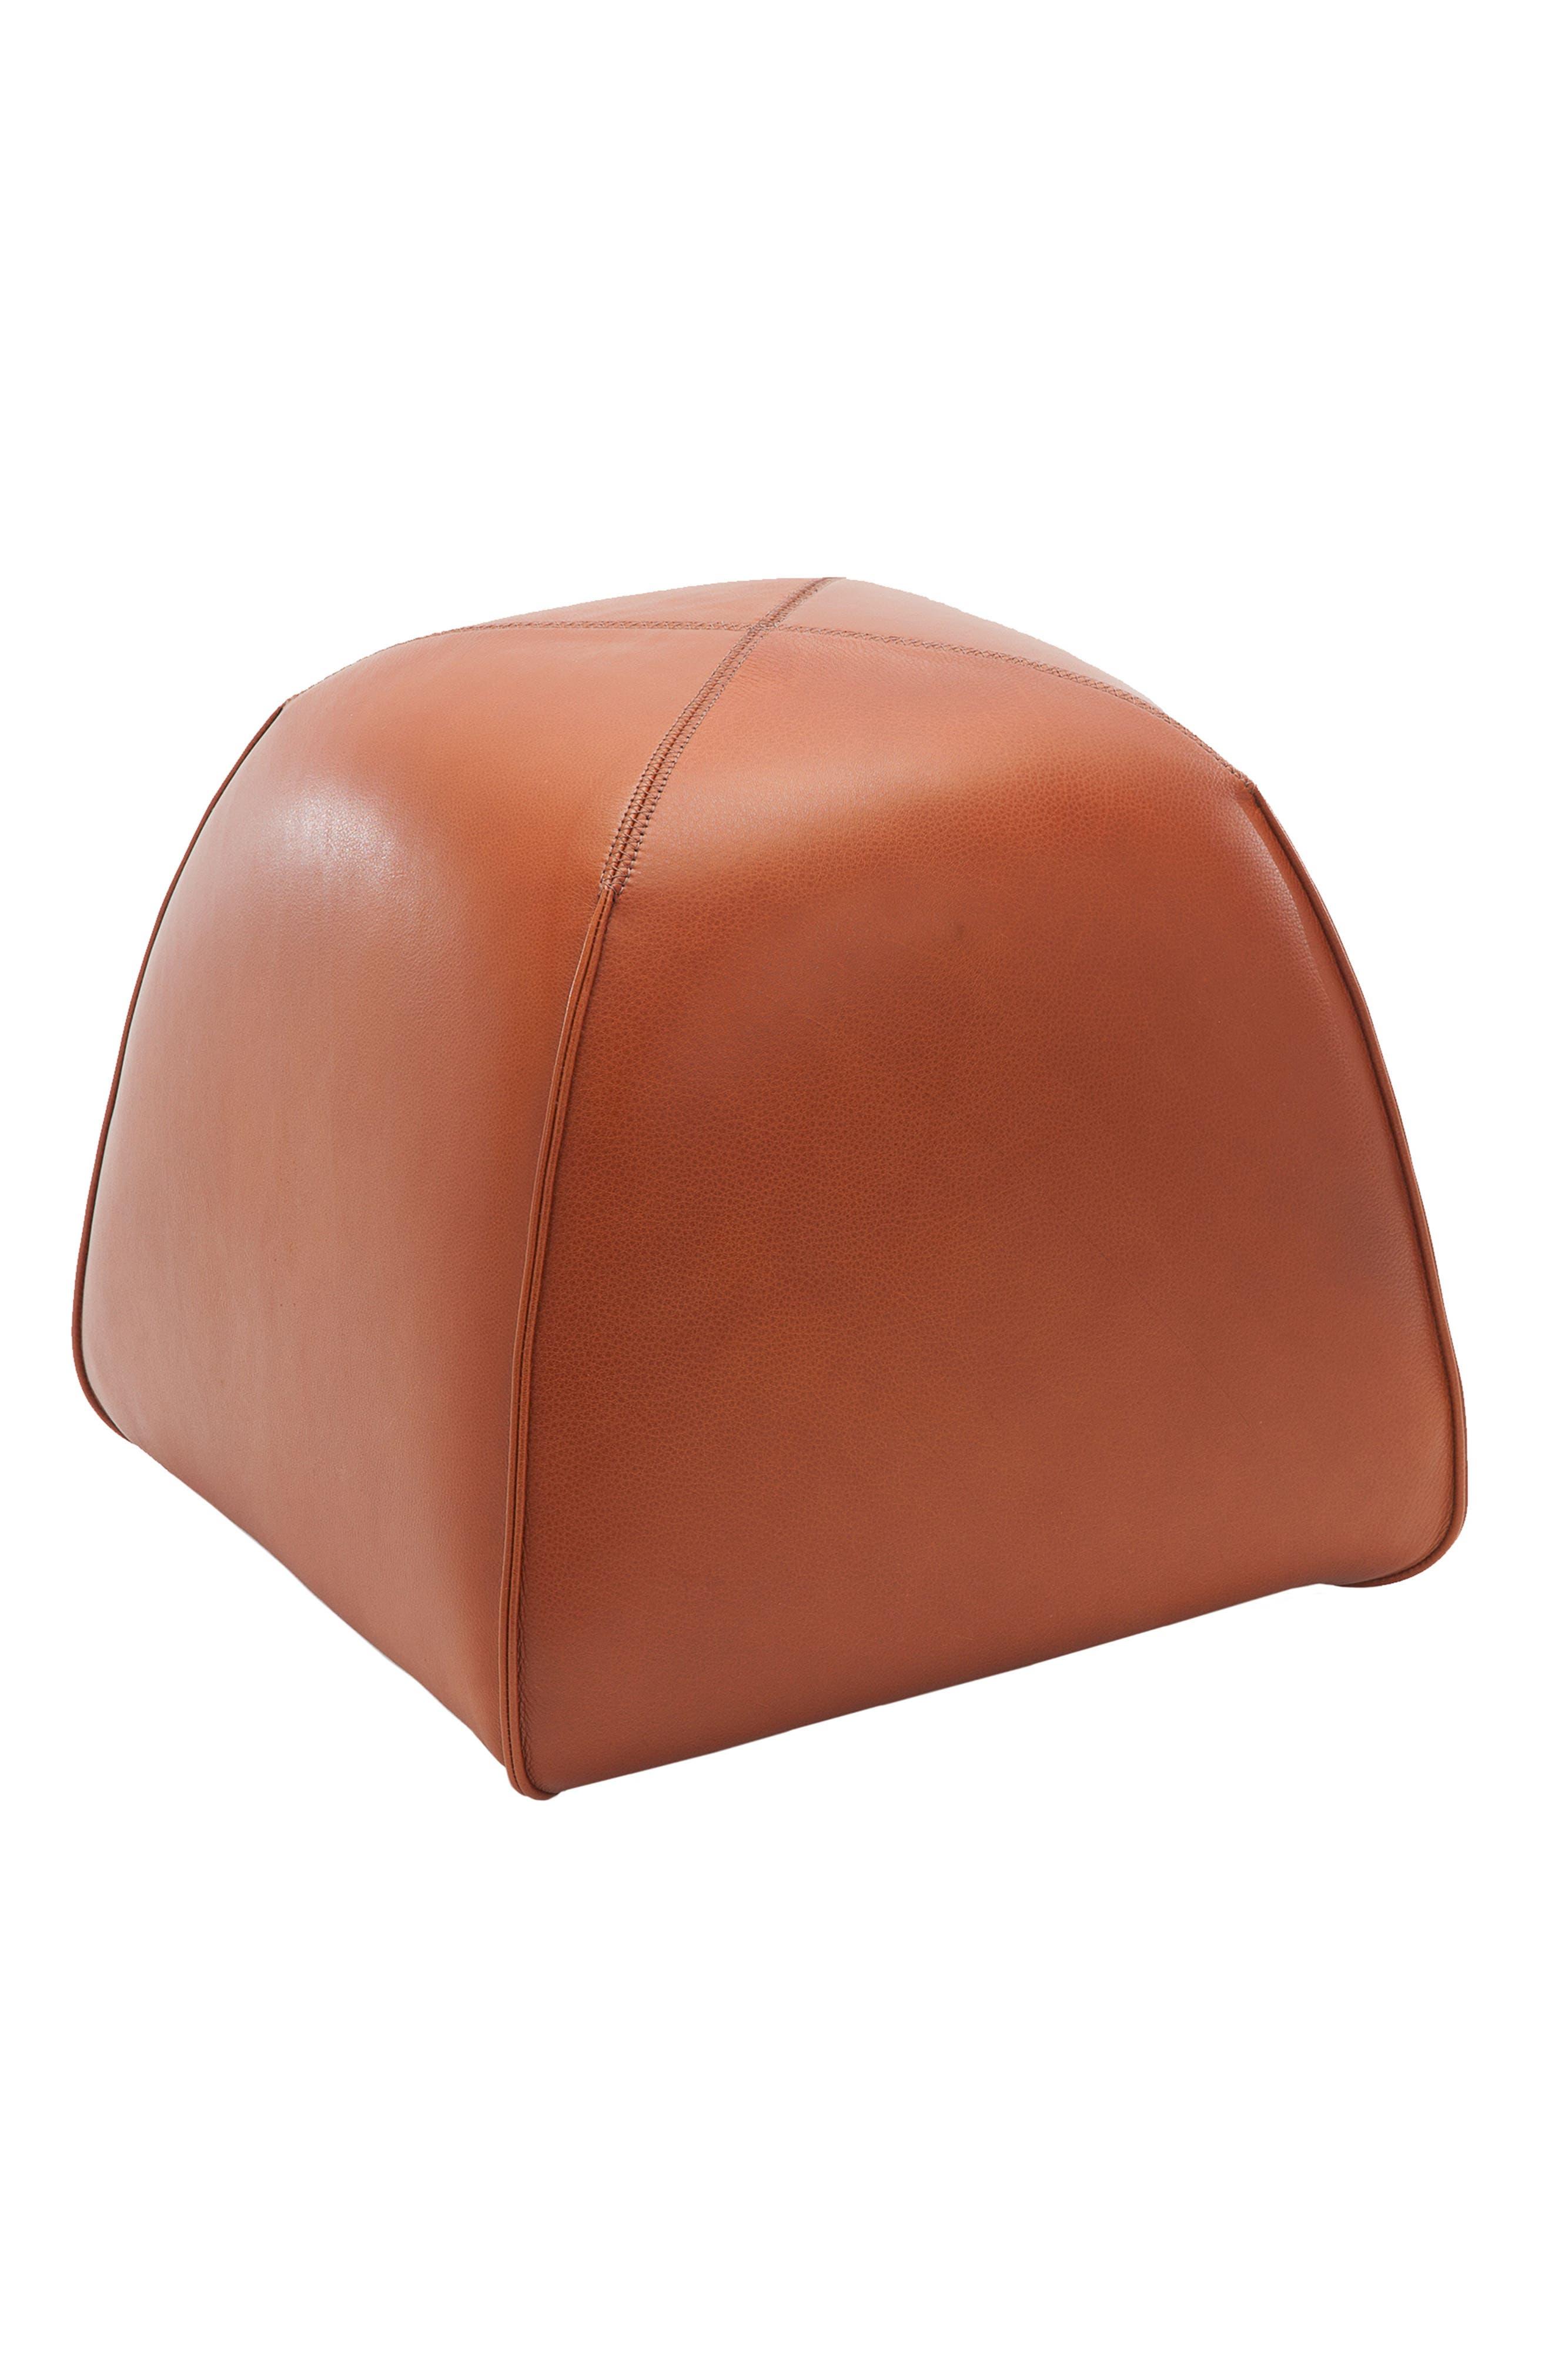 Design on Stock USA BimBom Leather Stool